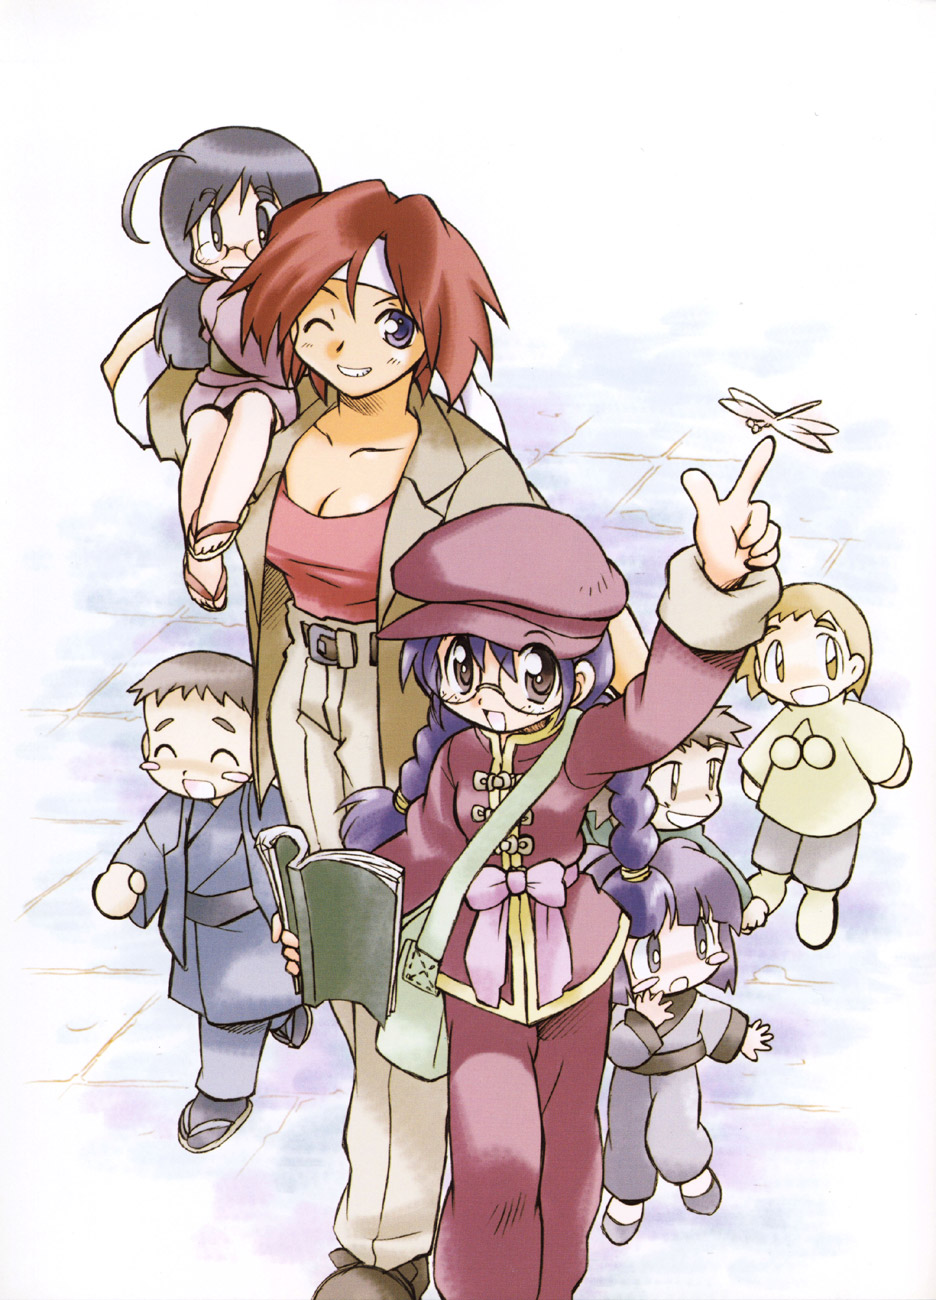 Sakura Wars illustrations: the Origin + Tribute image by Sasaki Ryo